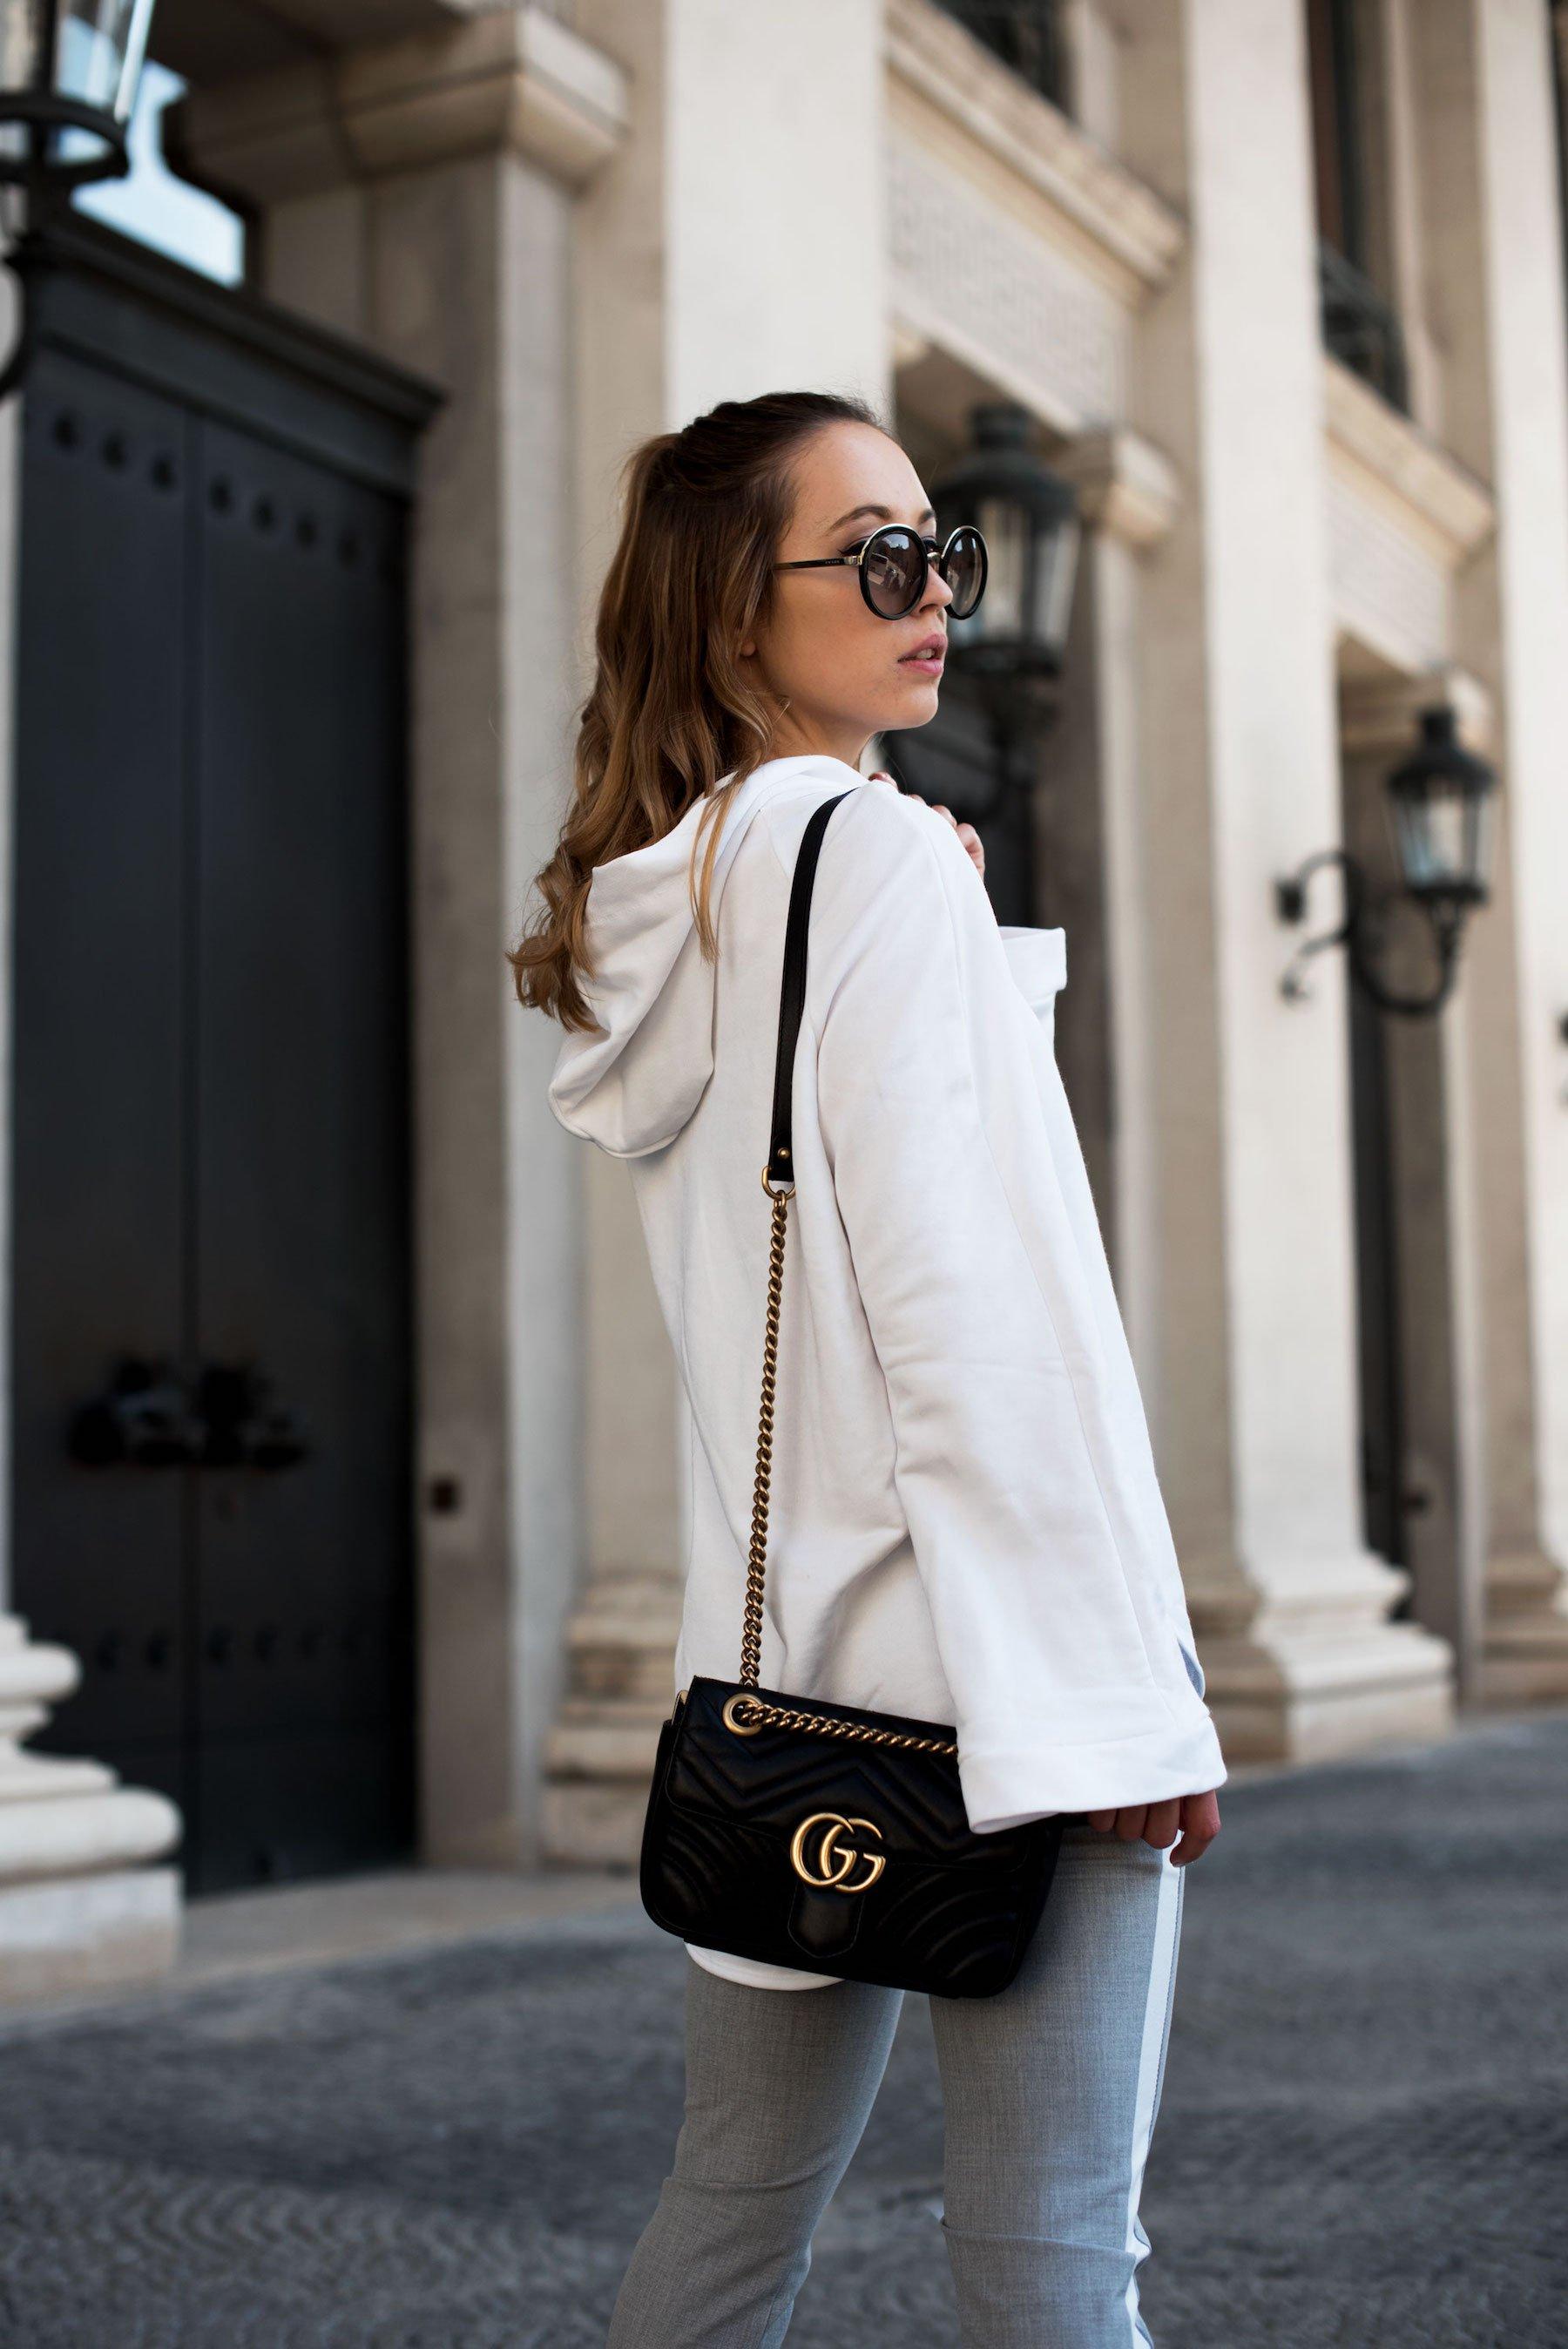 Sweatshirt Trend, Weißes Sweatshirt, Stylemocca